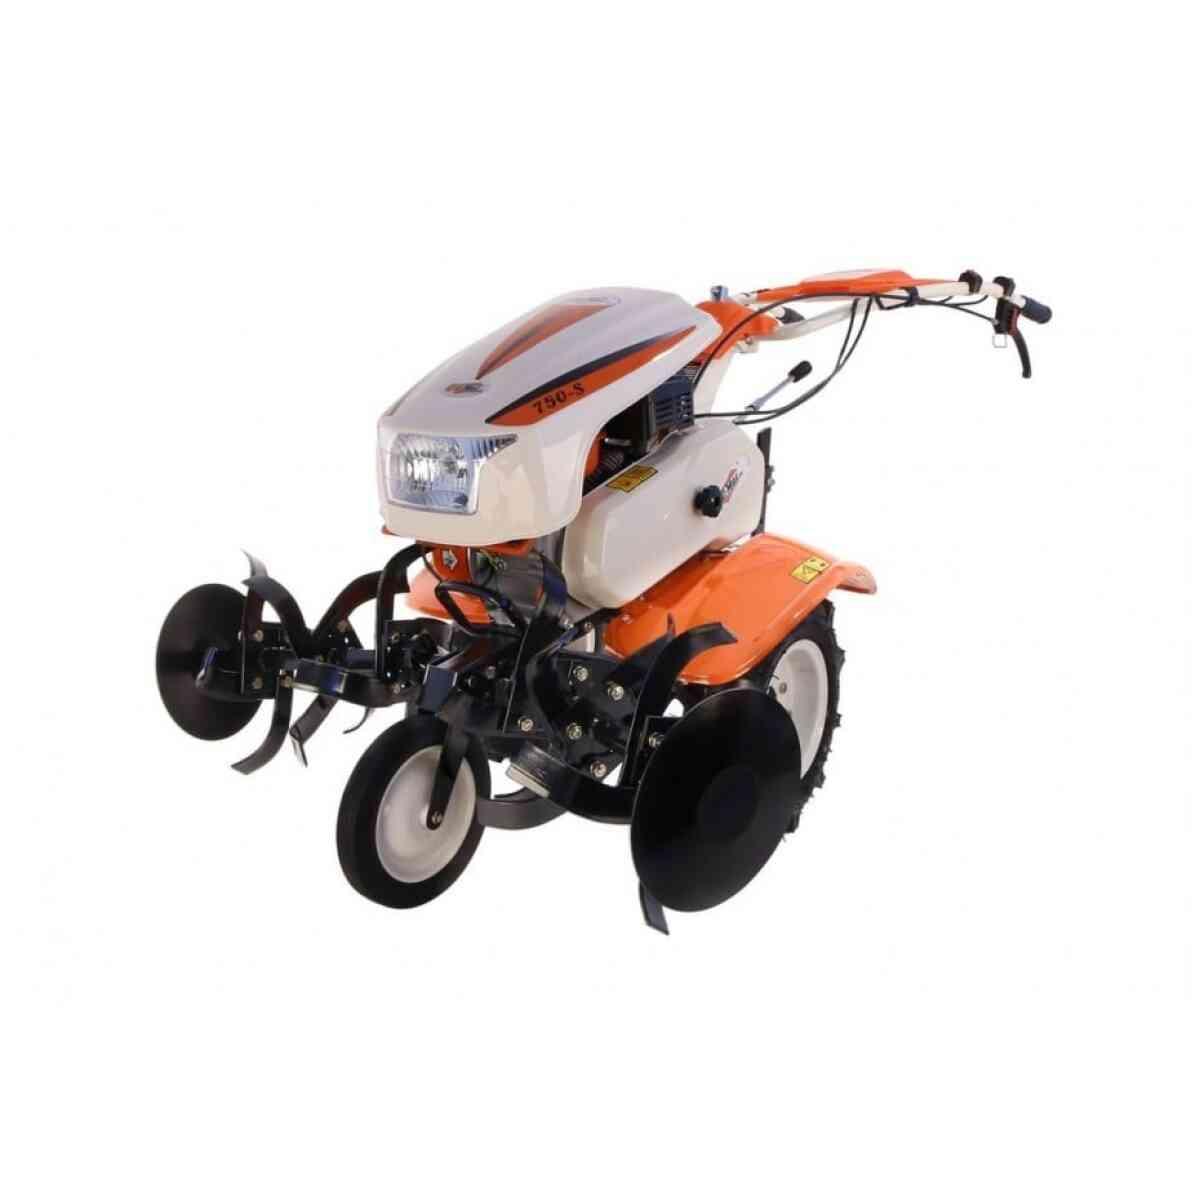 motocultor o mac 750s o mac.ro 2 1 29